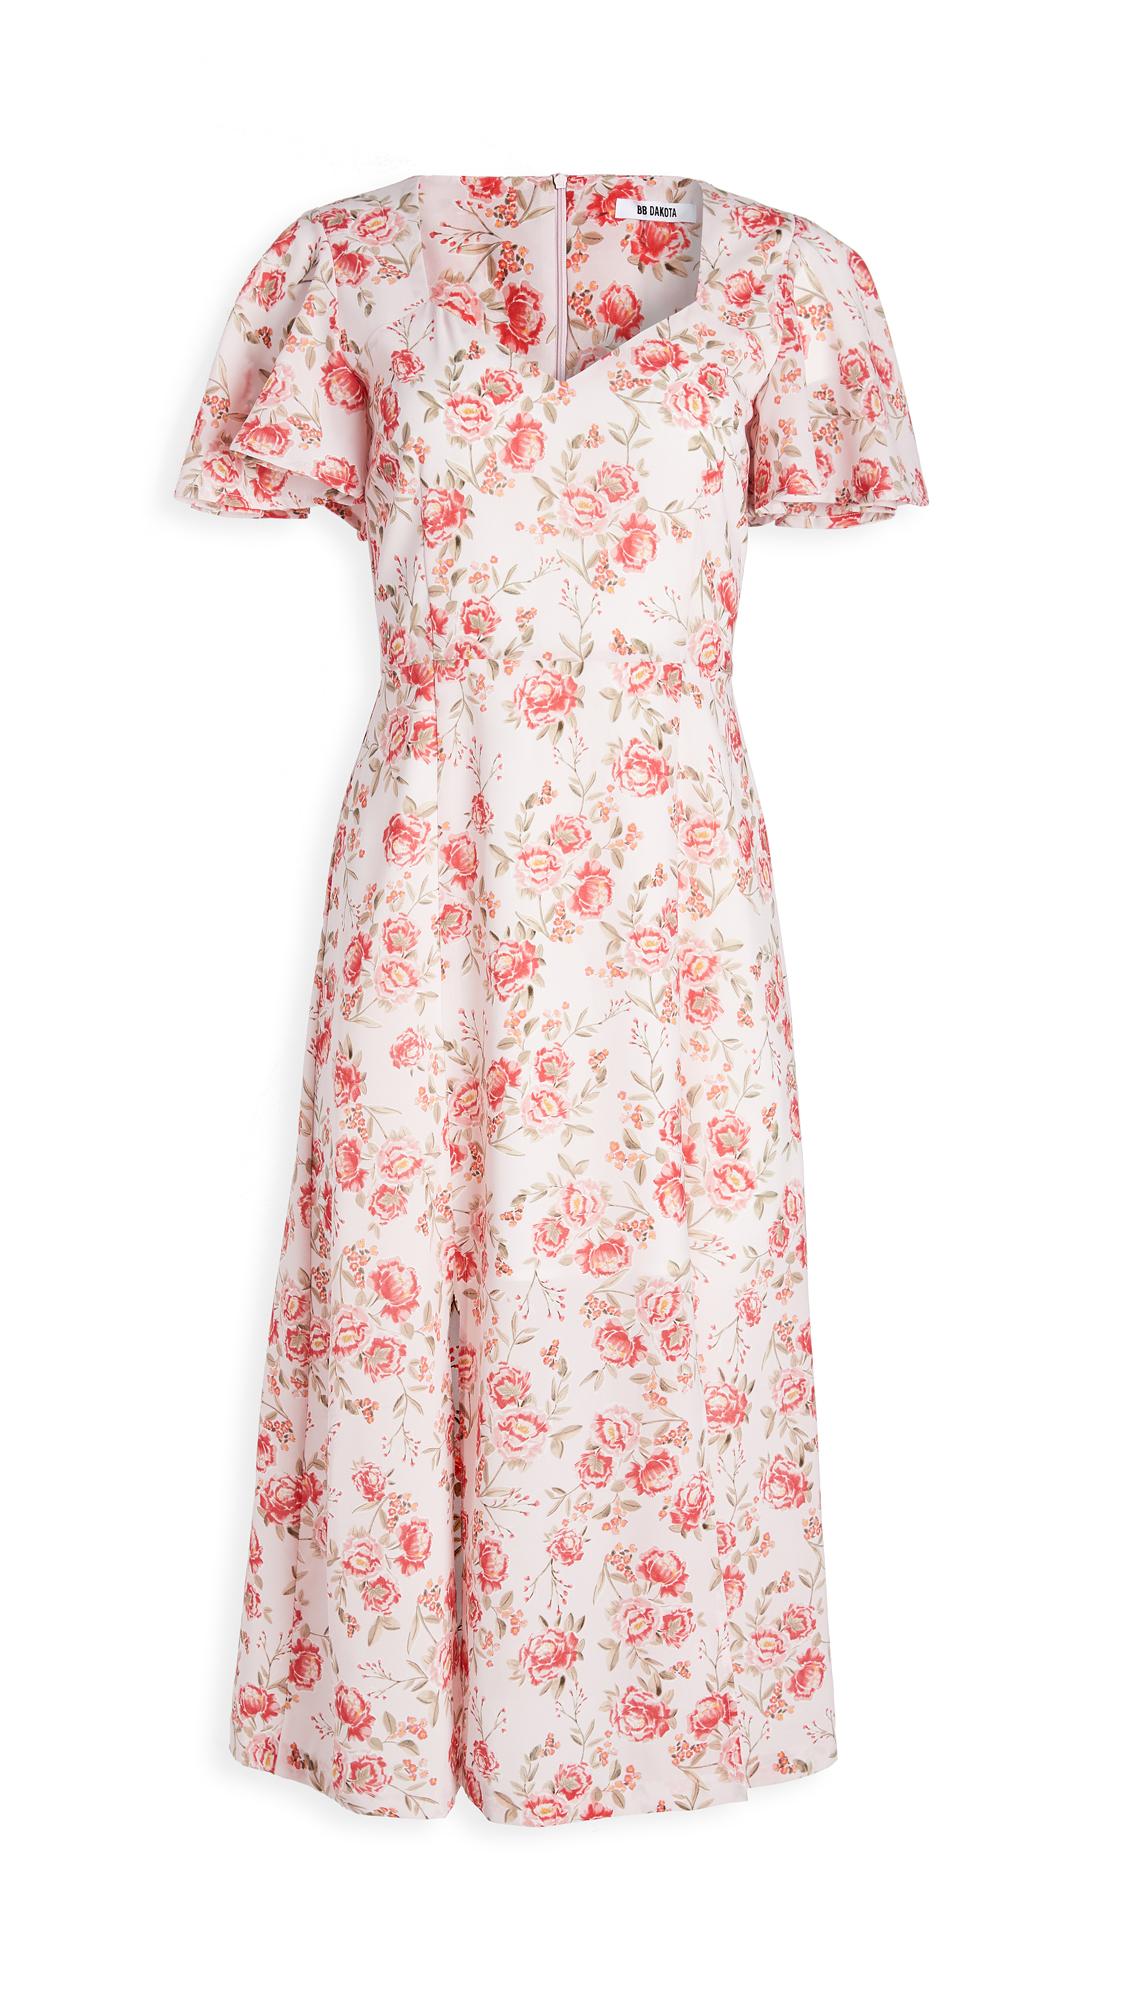 BB Dakota Endless Love Dress - 30% Off Sale